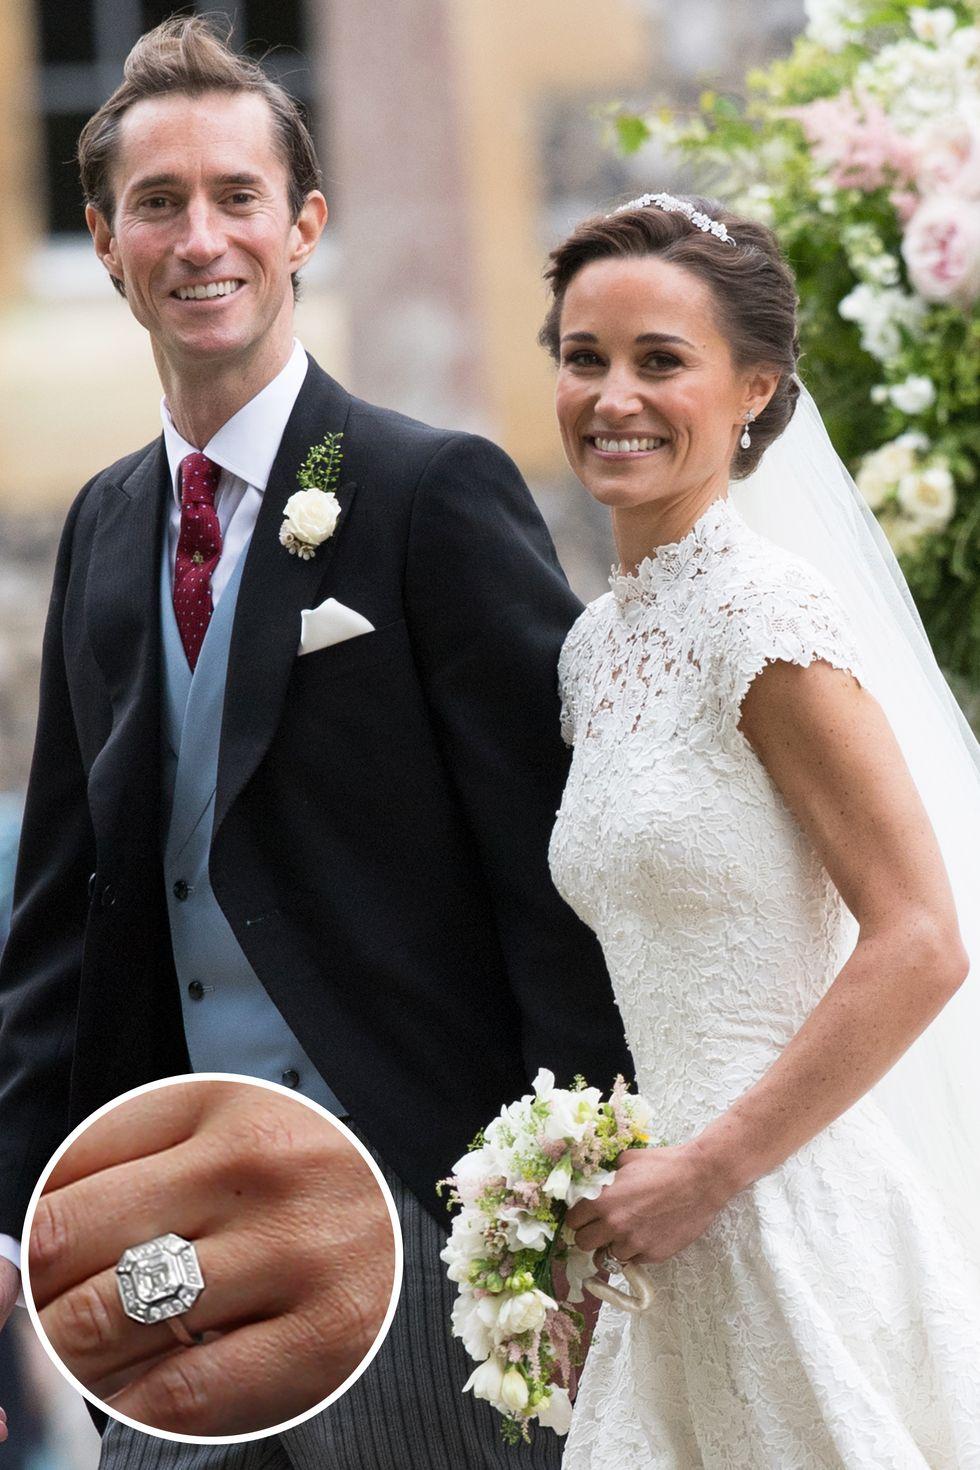 Celebrity Jewelry Pippa Middleton and James Matthews Show Their Diamond Cut Glittering Wedding Ring